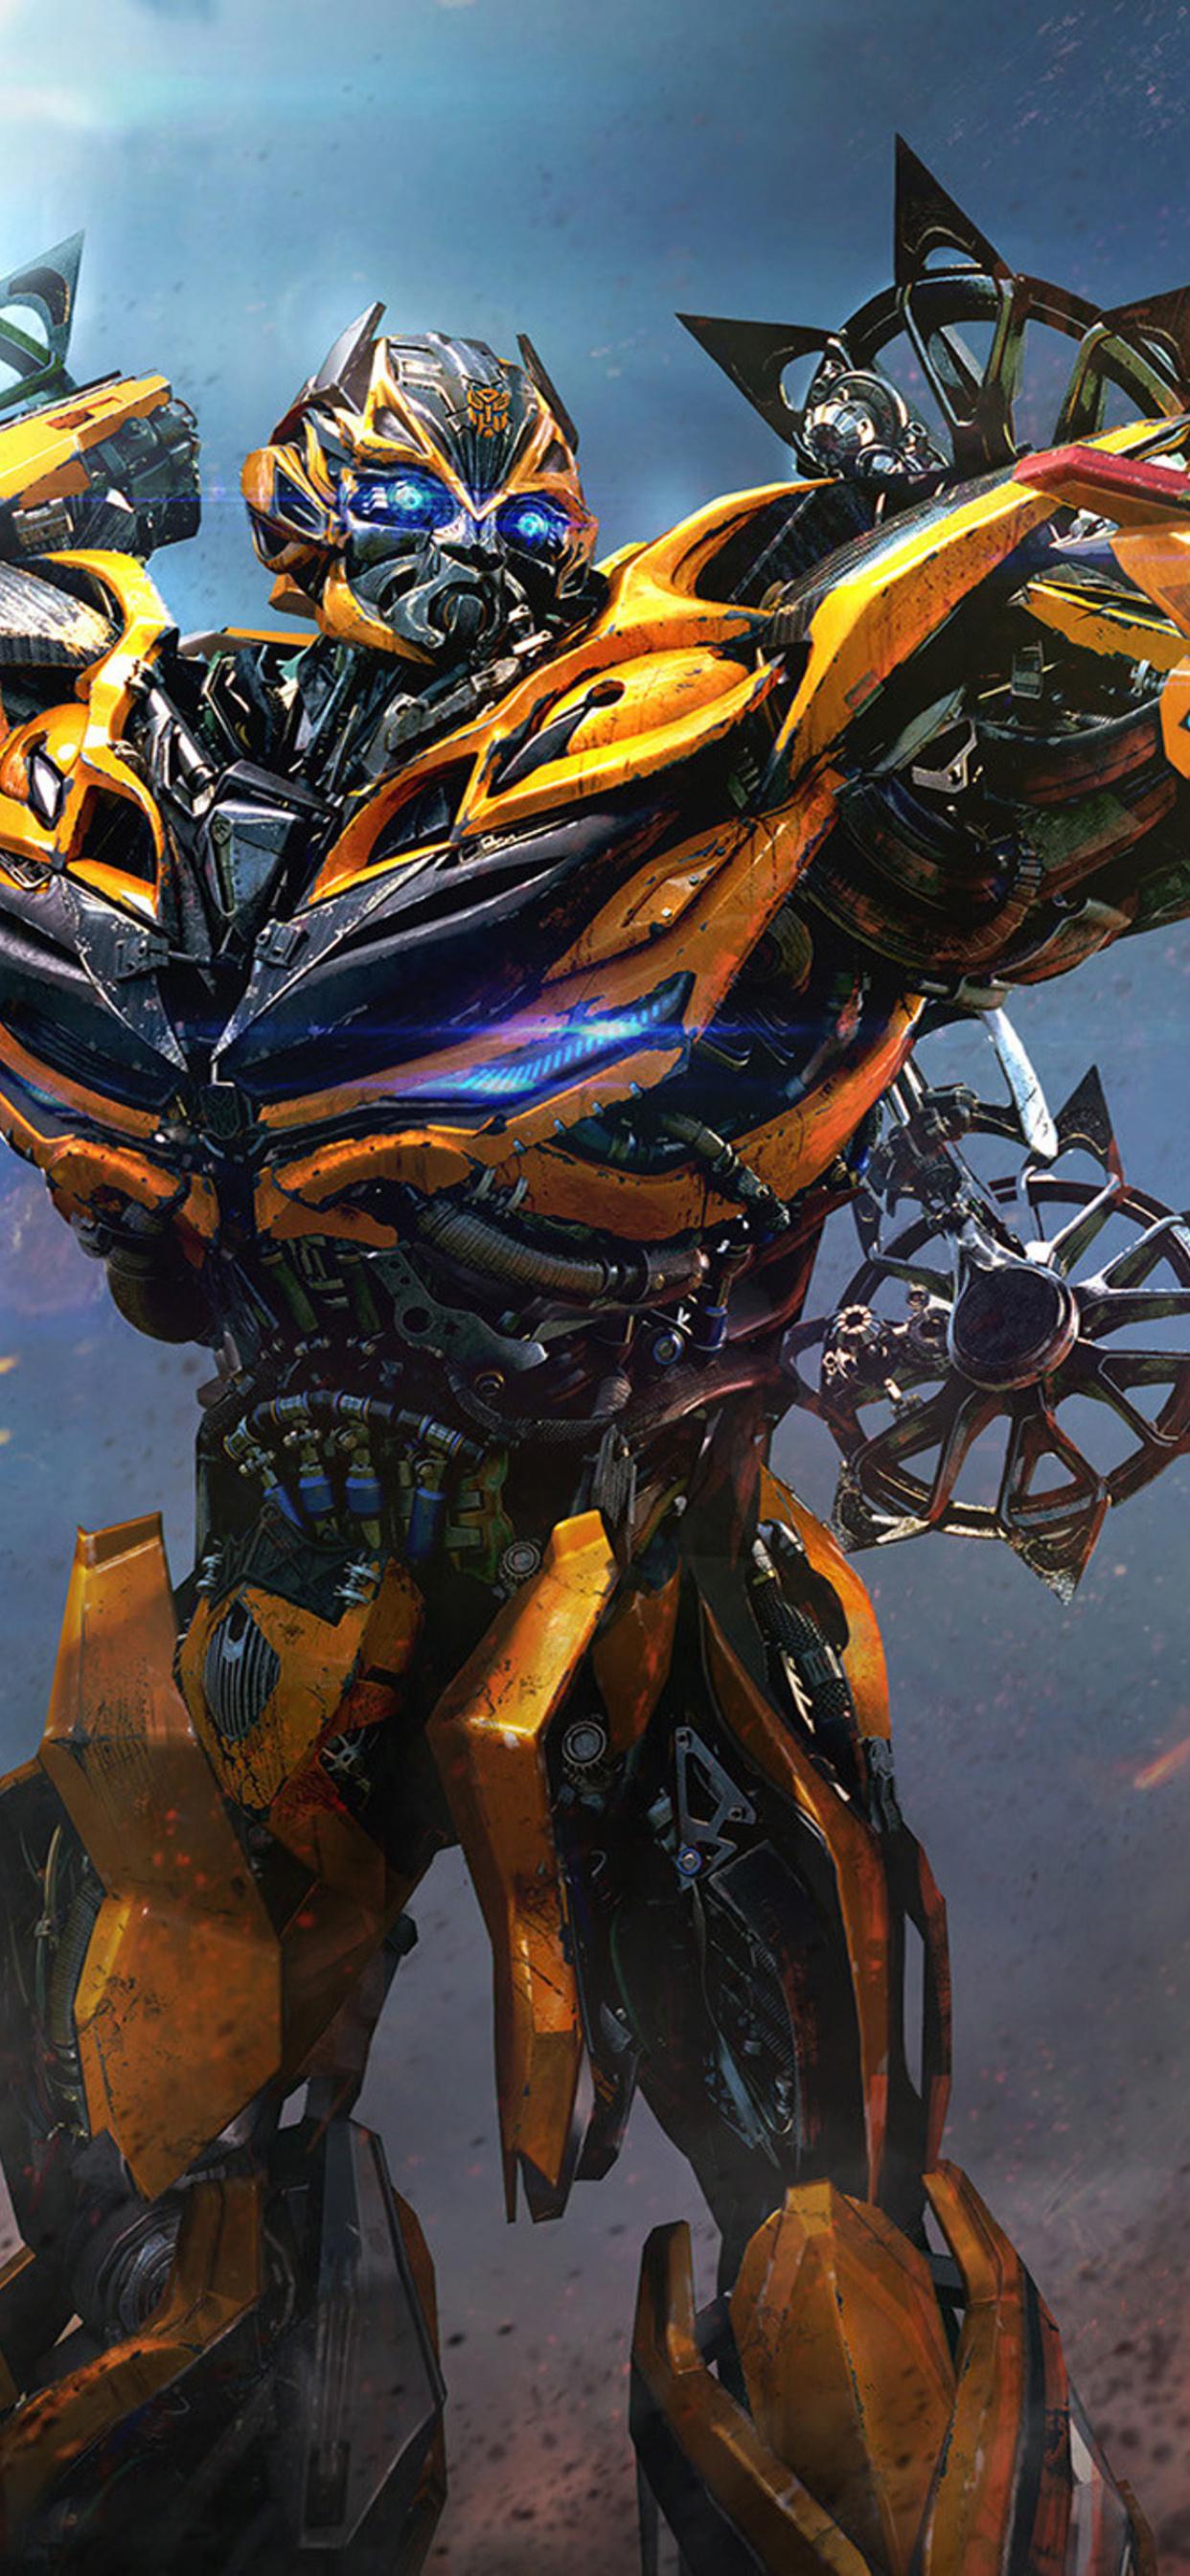 1242x2688 Transformers Bumblebee Iphone Xs Max Hd 4k